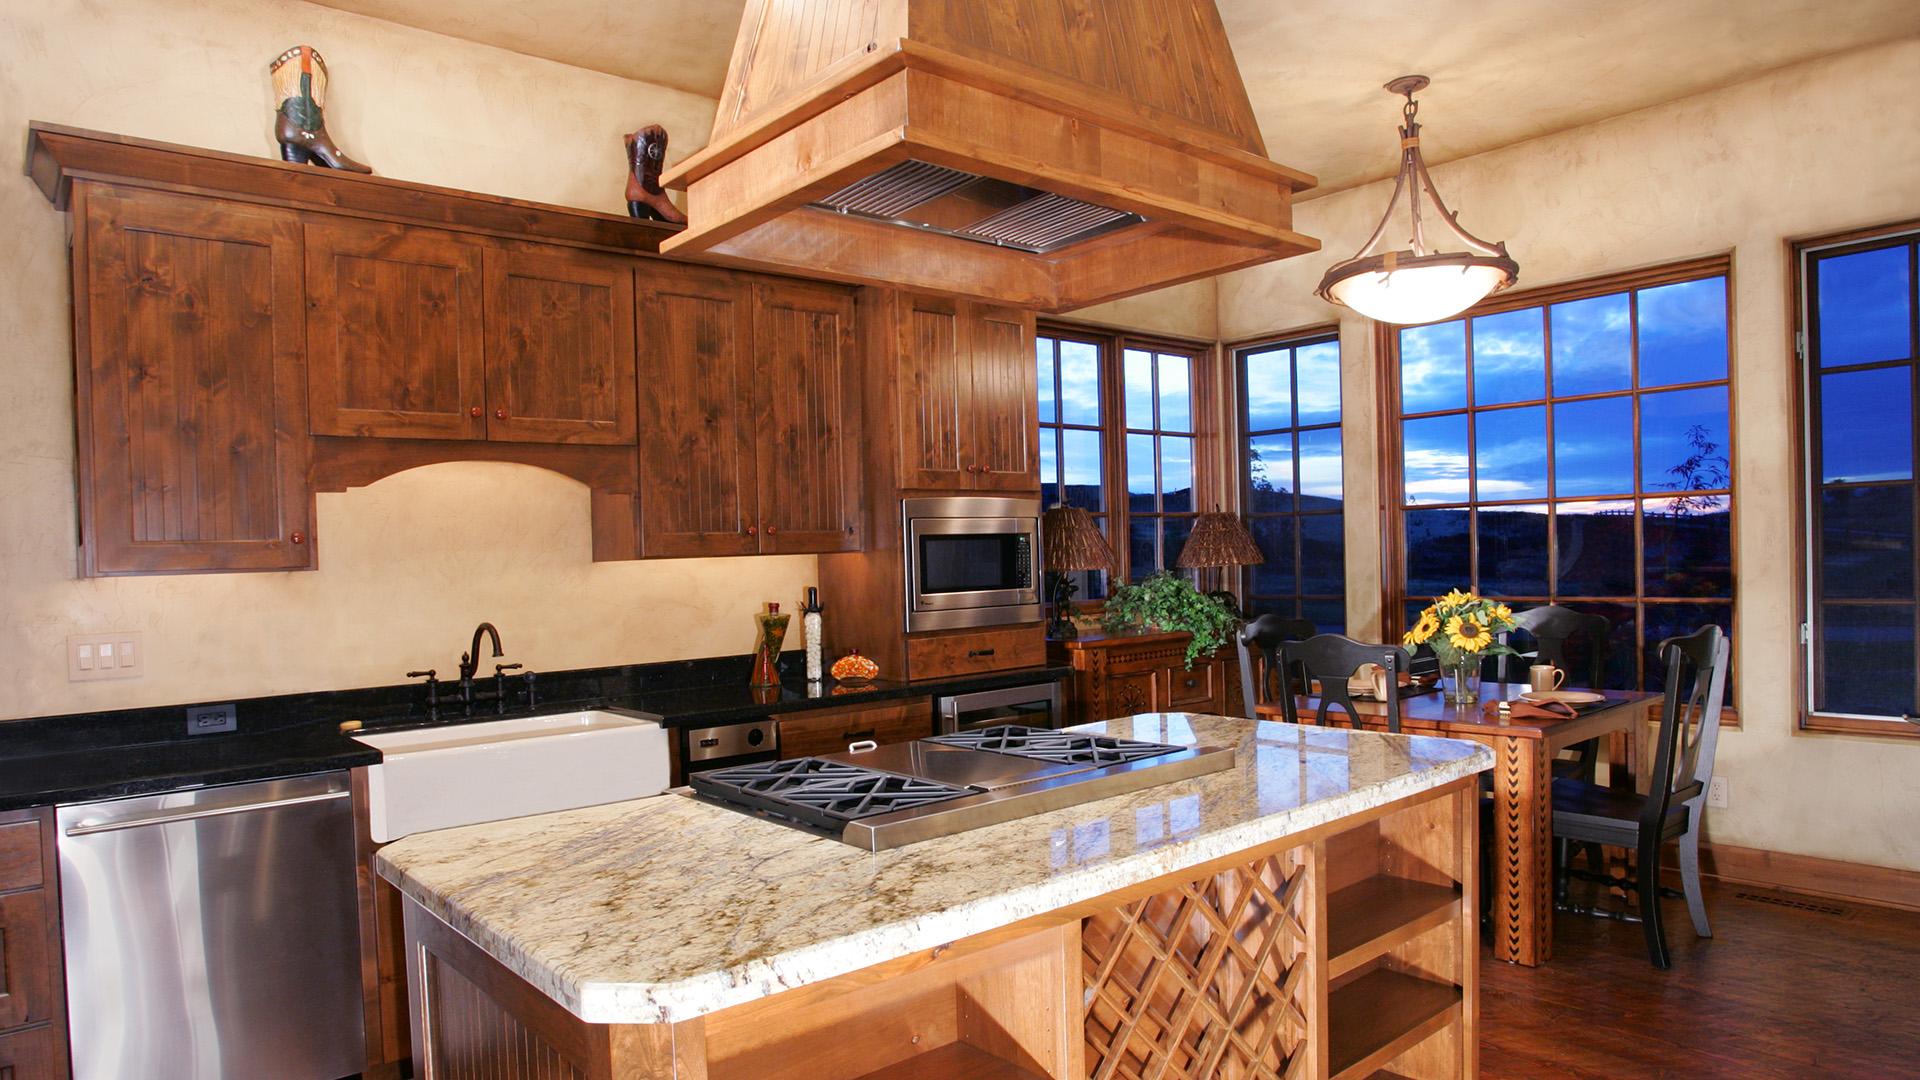 Coeur d'Alene Residence Kitchen